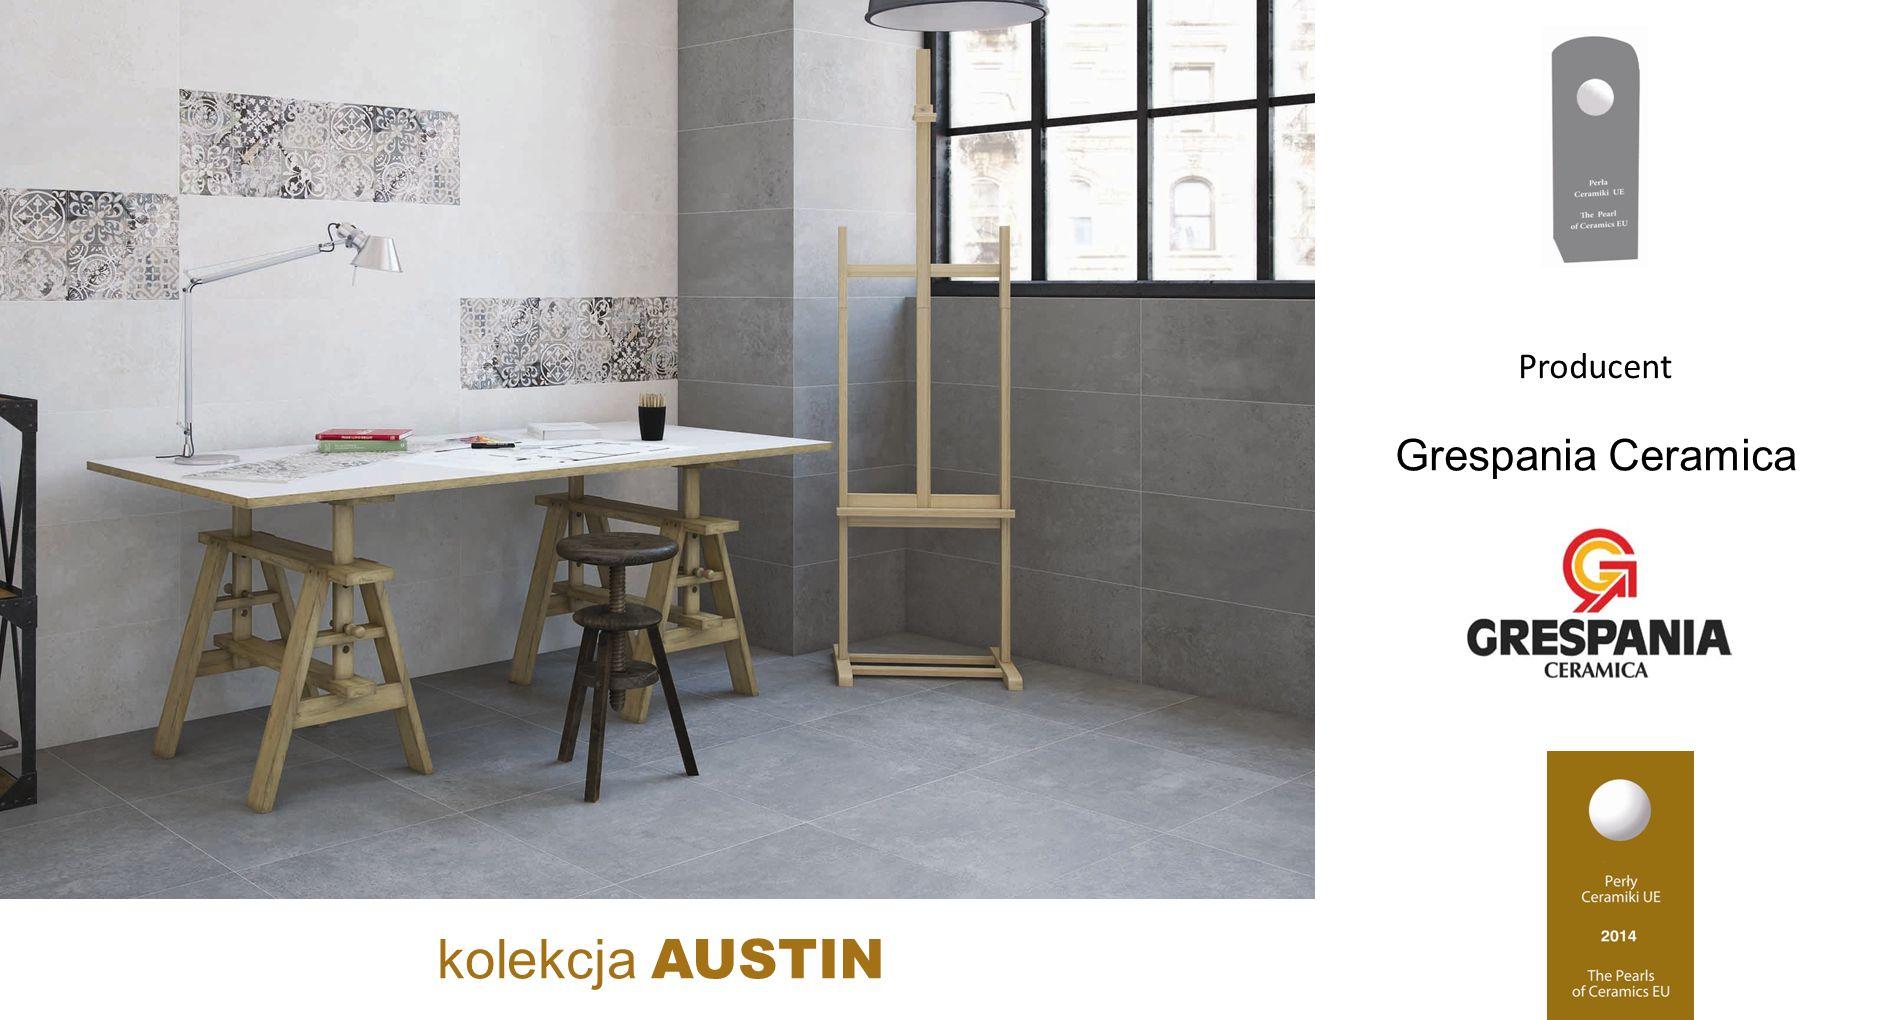 Grespania Ceramica kolekcja AUSTIN Producent